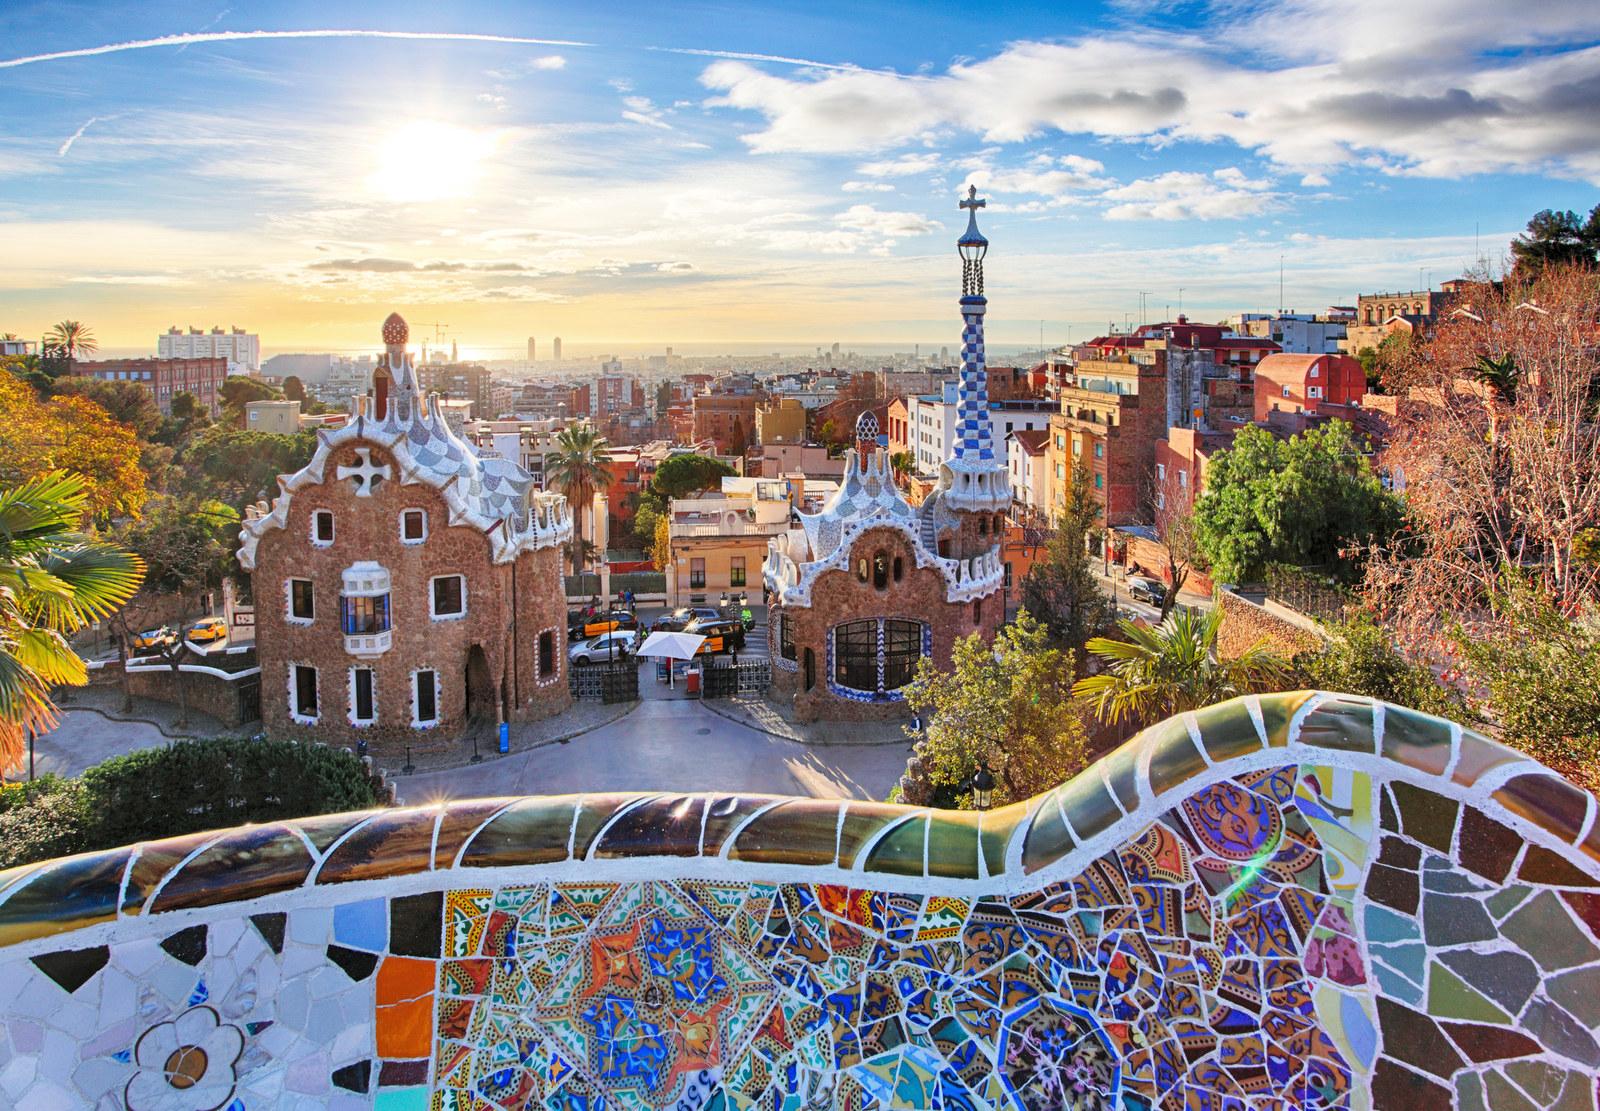 36 Photos That Showcase The Unique Beauty Of Barcelona